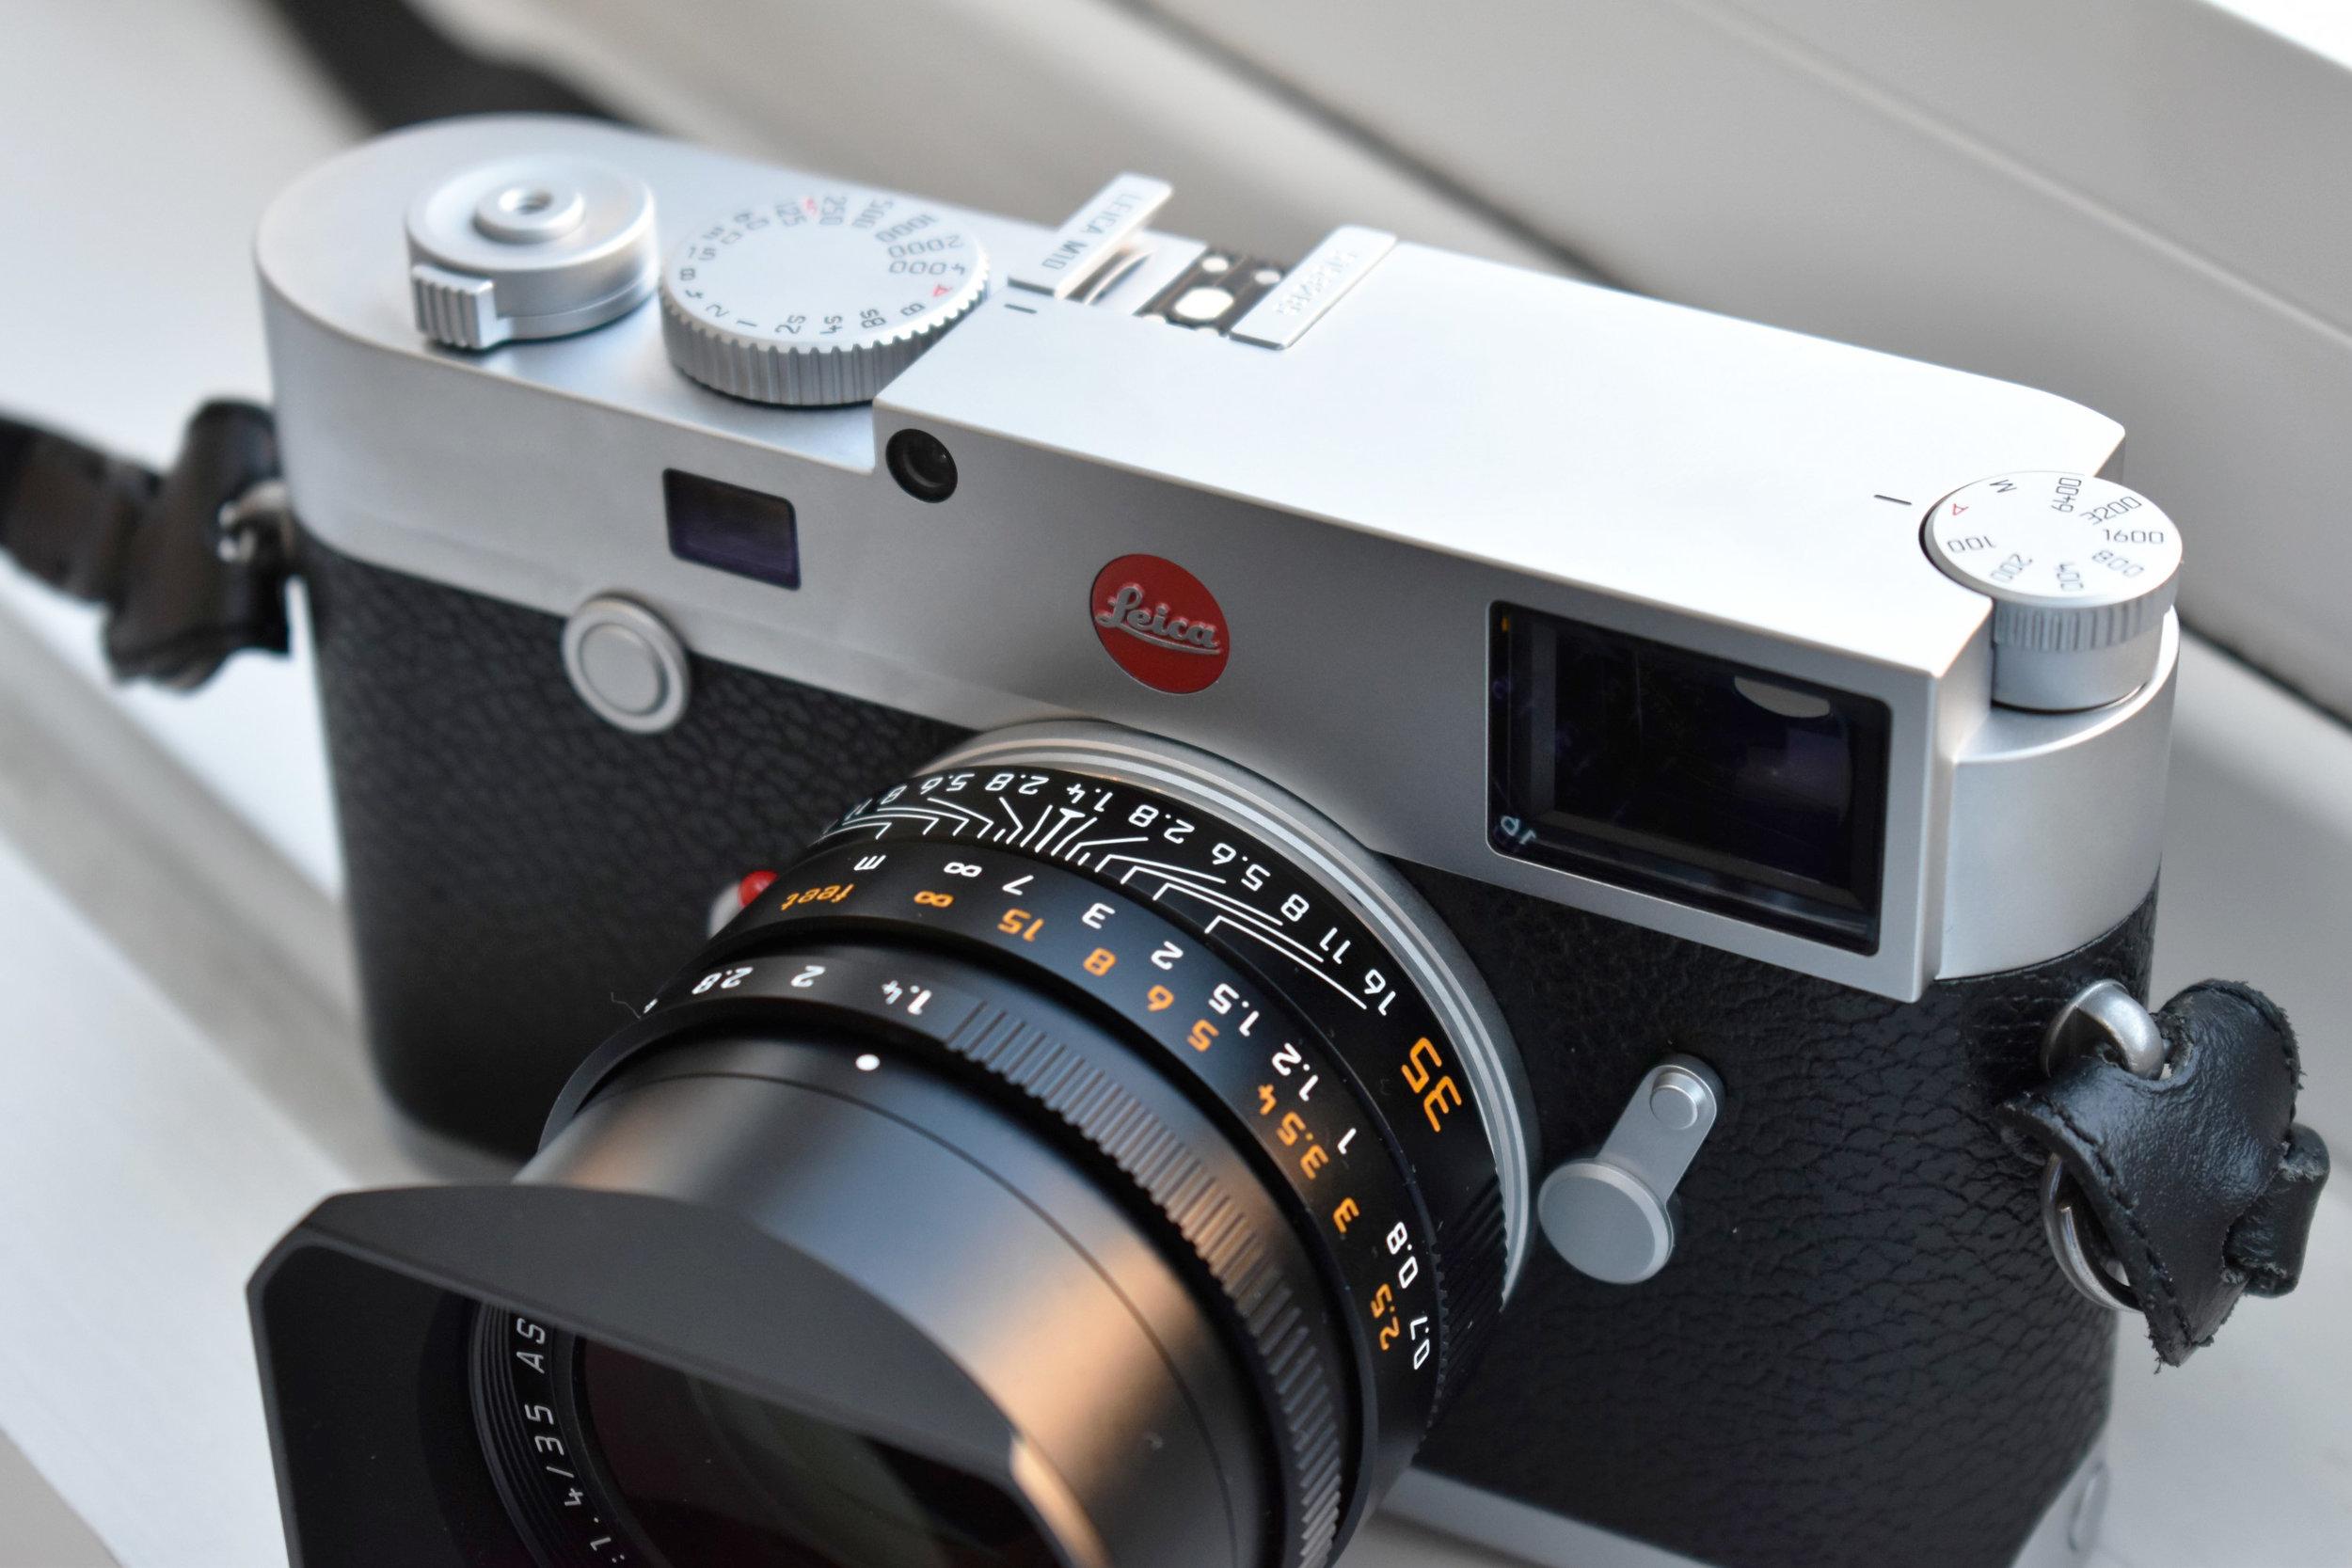 highres-Leica-M10-7_1490351678.jpg